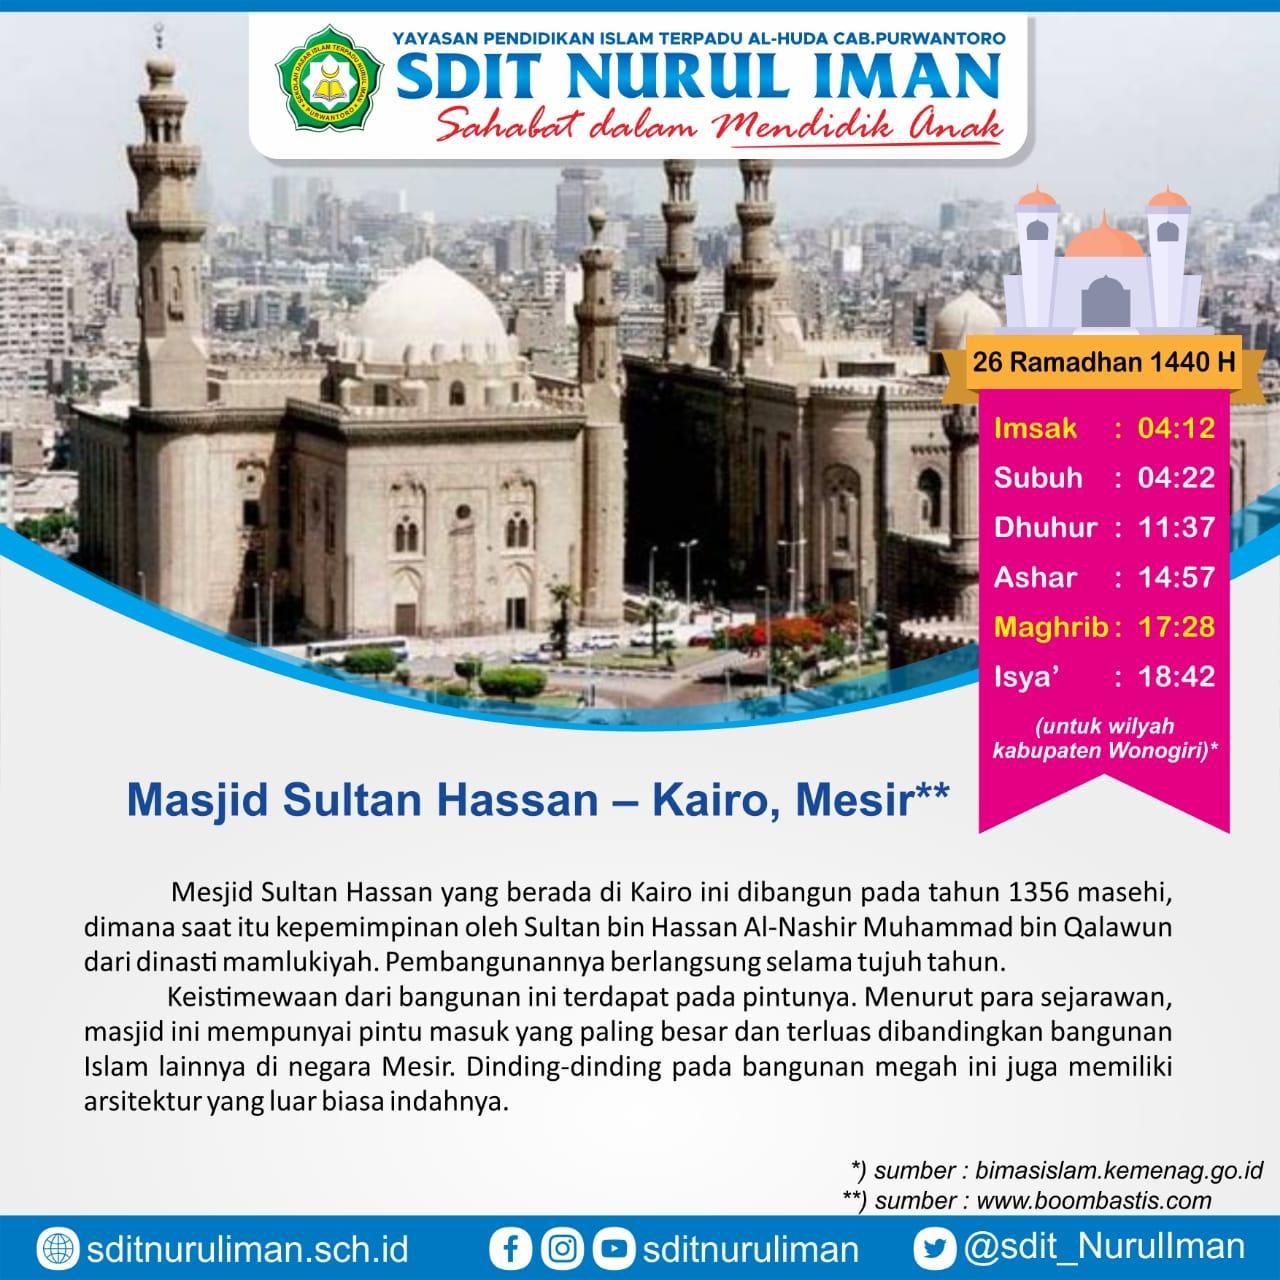 Masjid Sultan Hassan